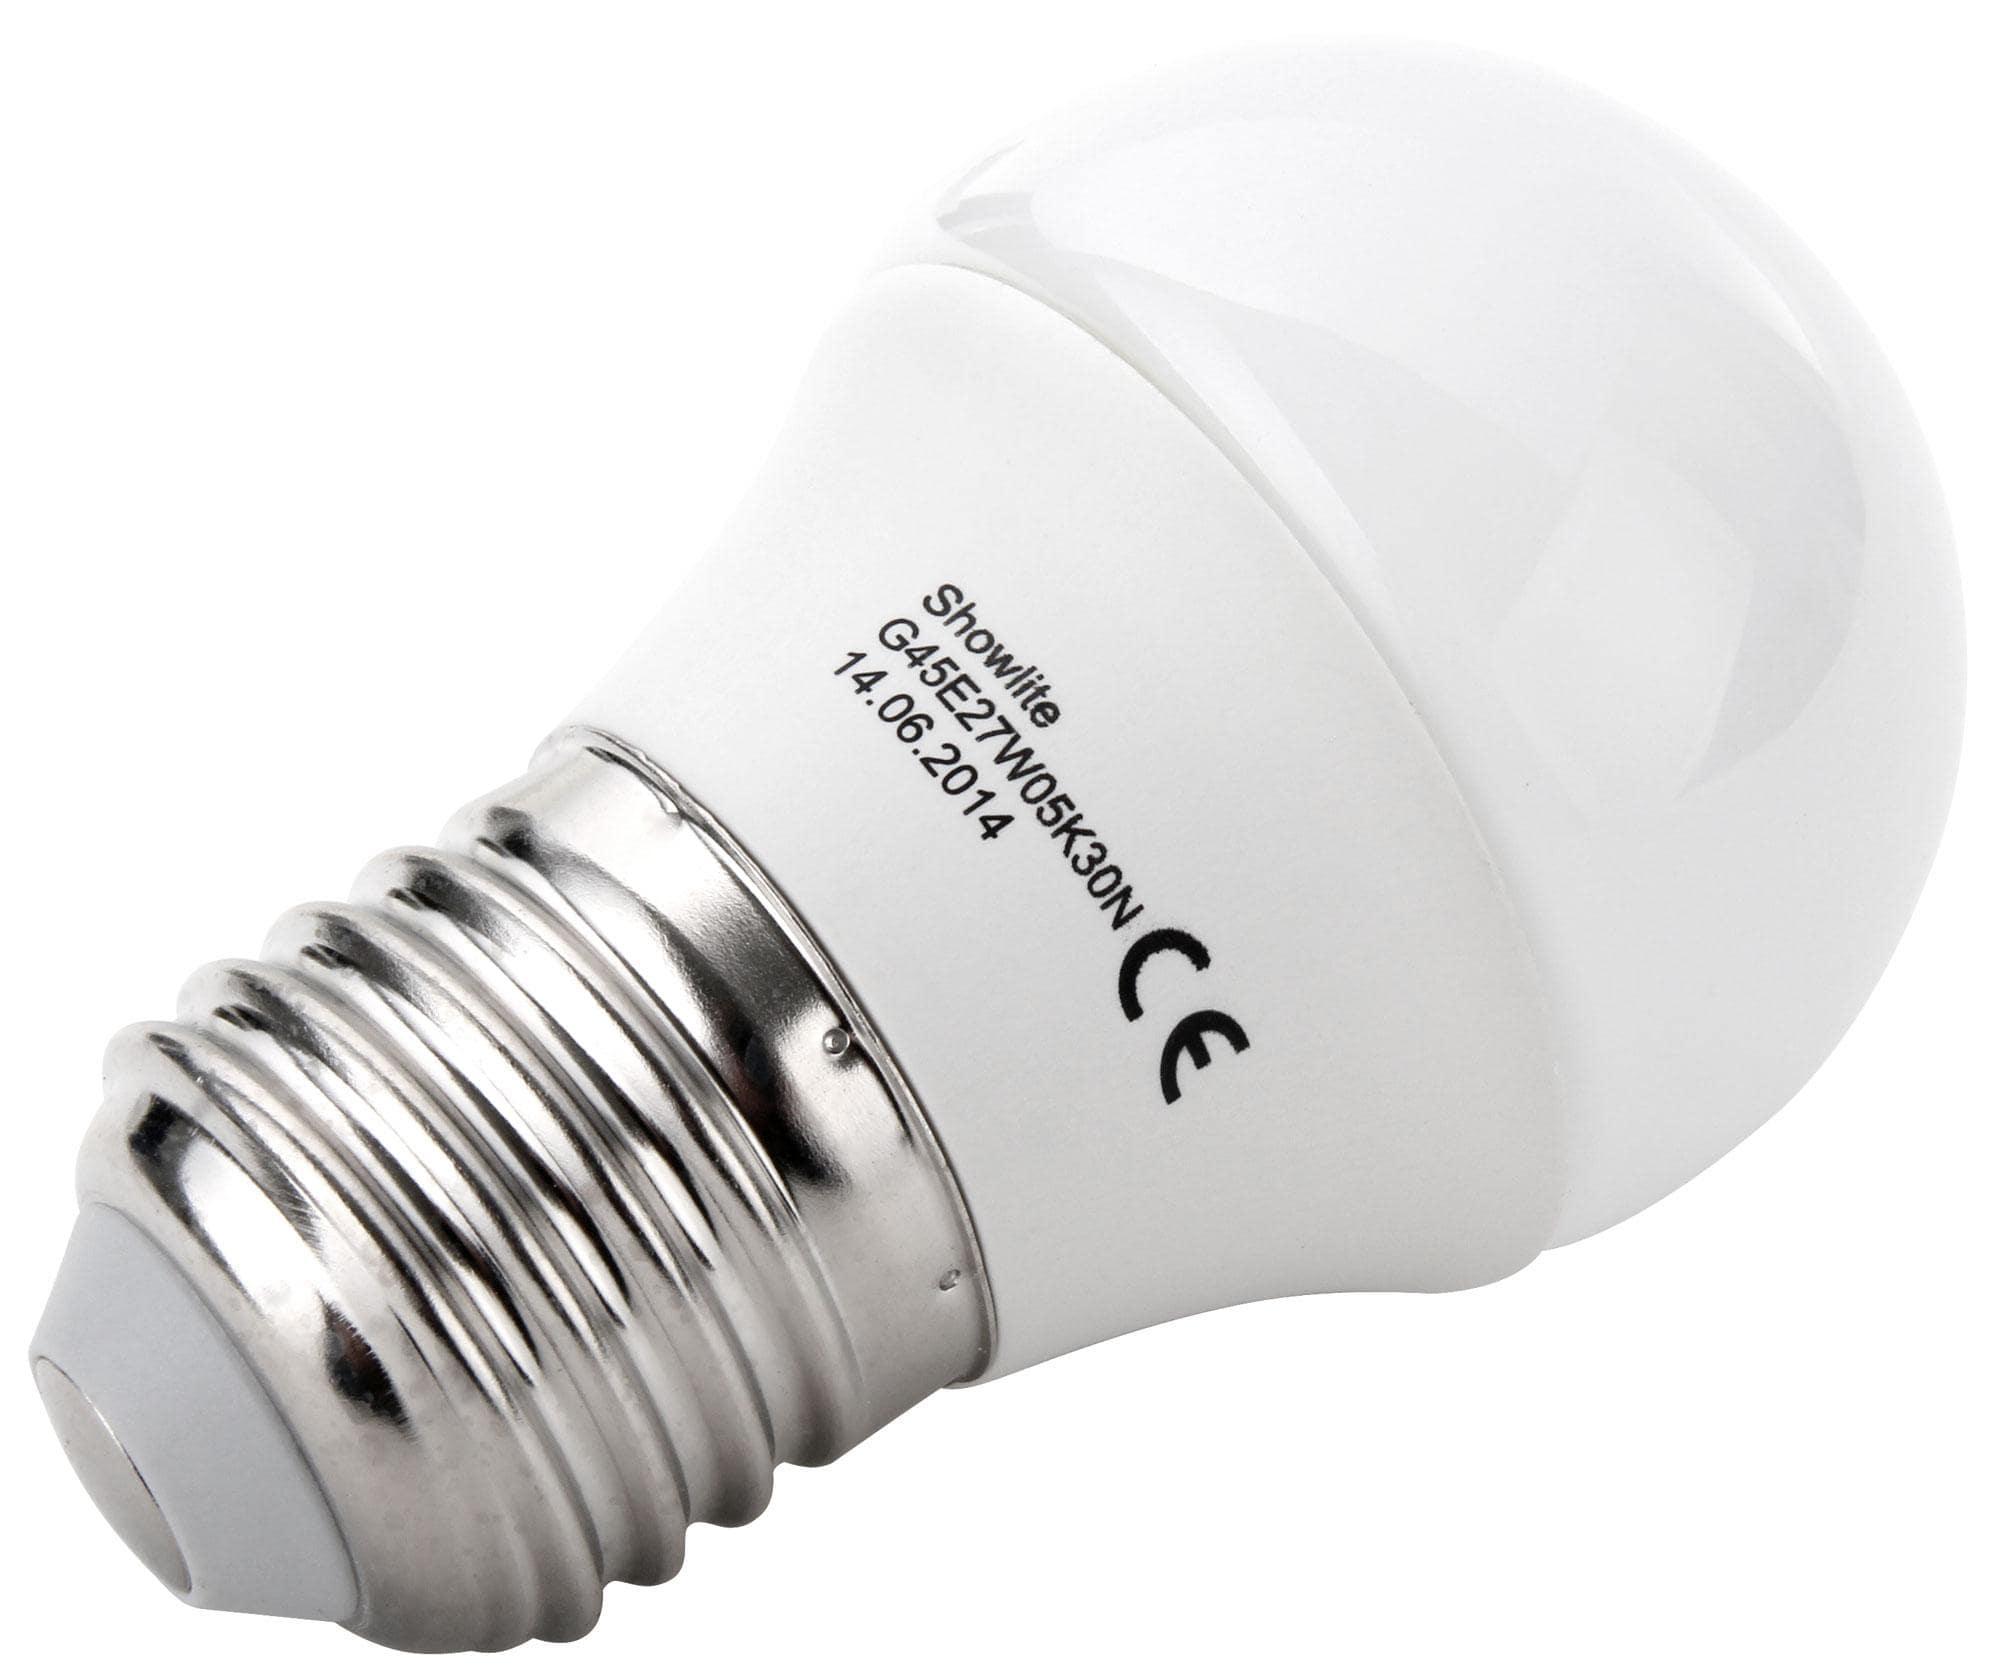 showlite led bulb g45e27w05k30n 5 watts 300 lumens e27. Black Bedroom Furniture Sets. Home Design Ideas